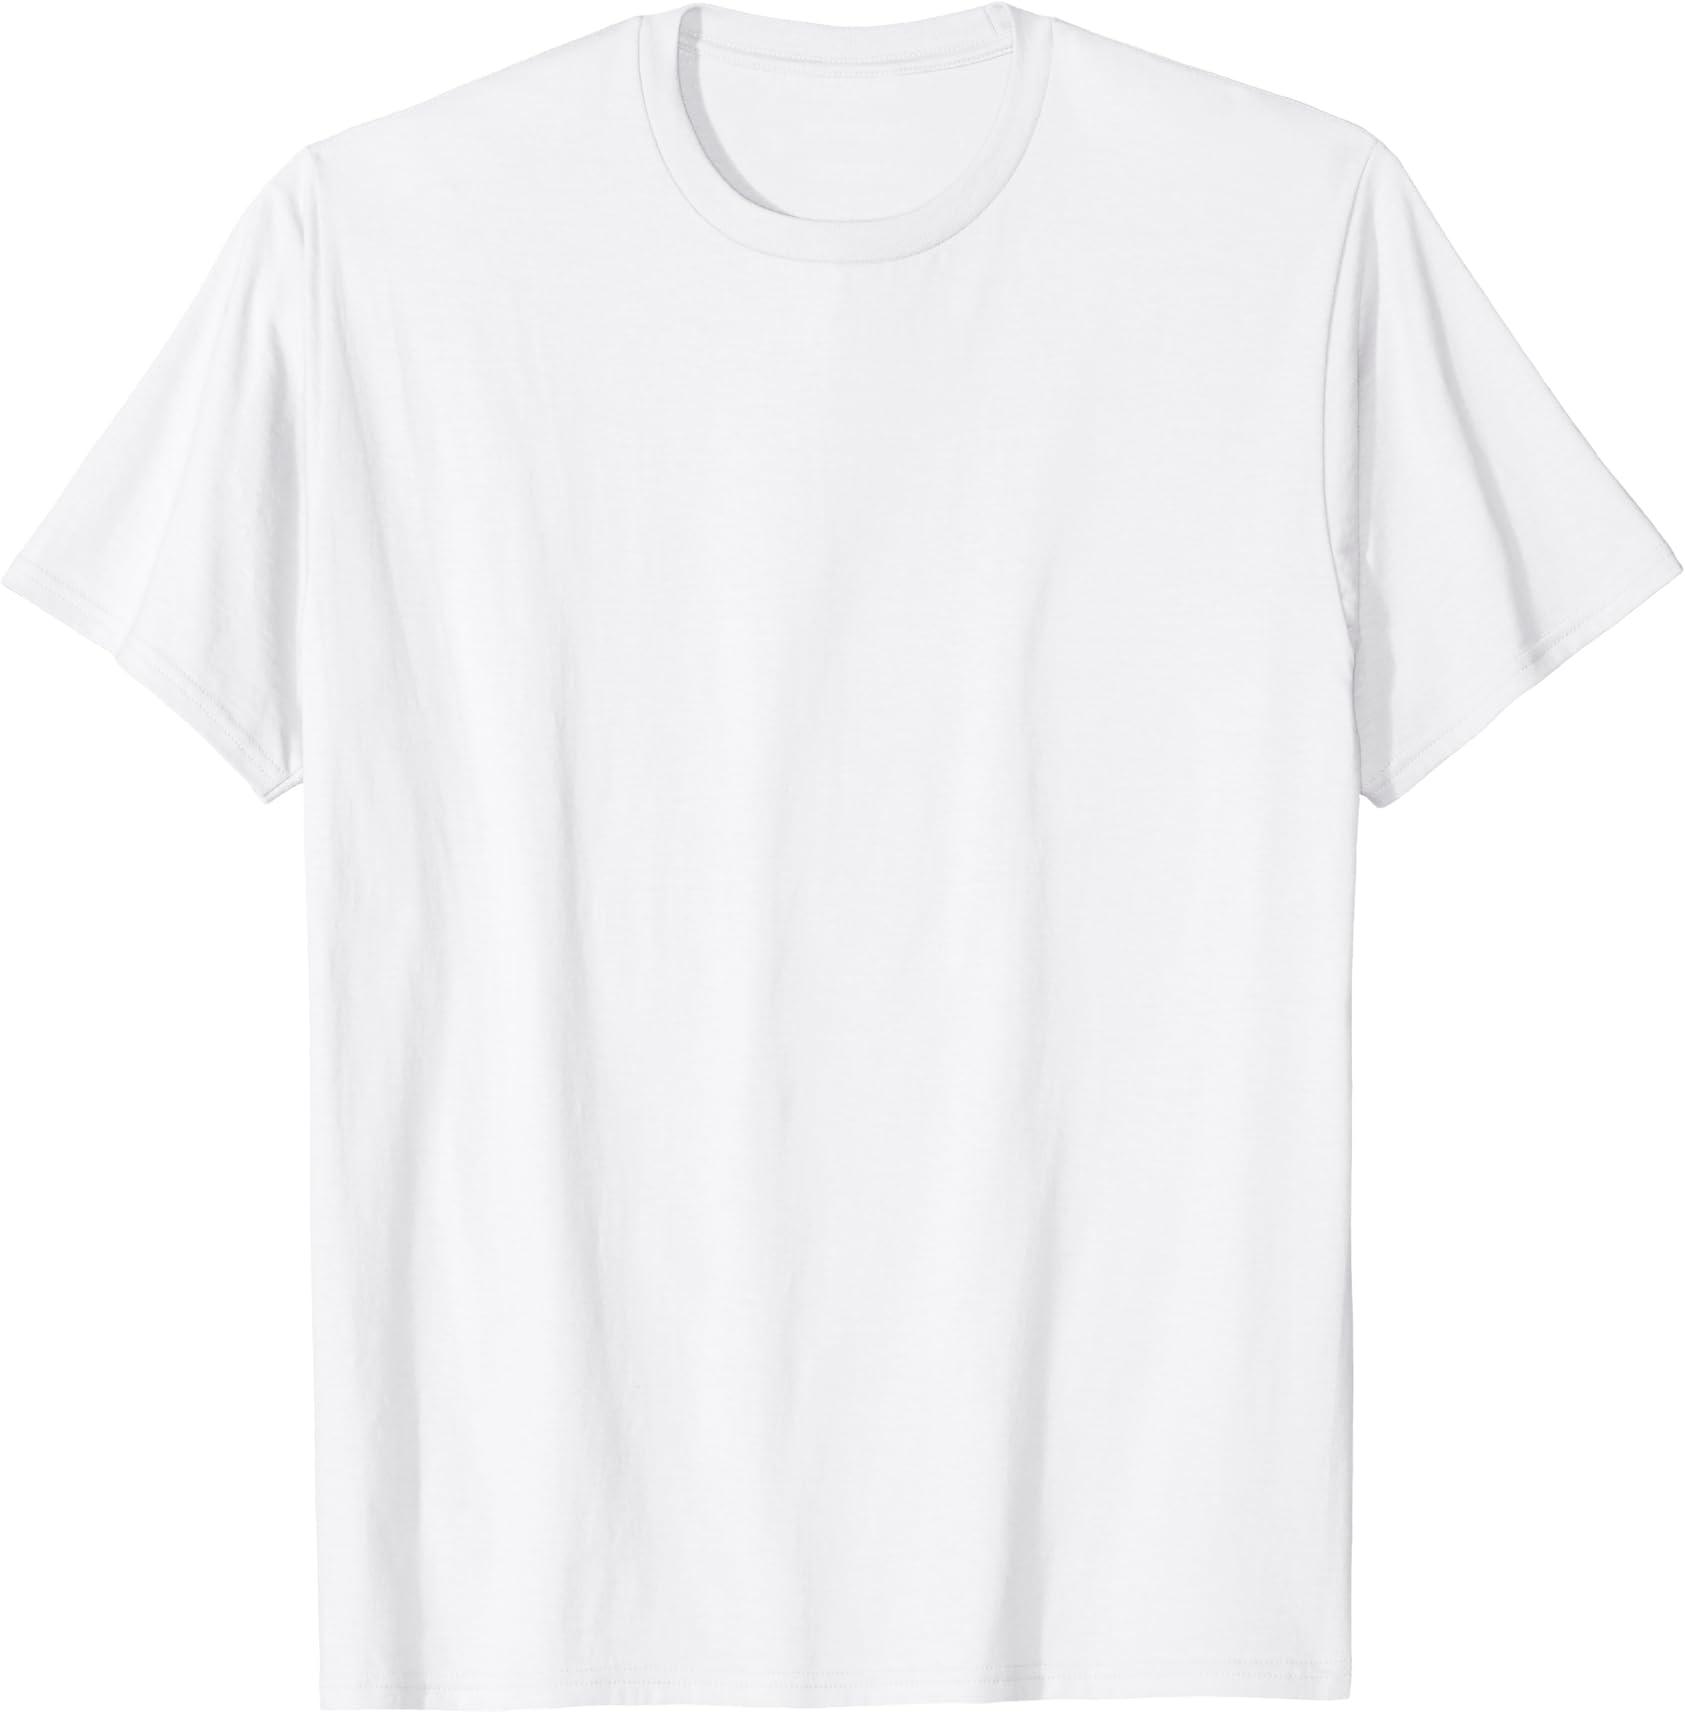 PORG WARS Men/'s T-Shirts Clothing Tees S-2XL